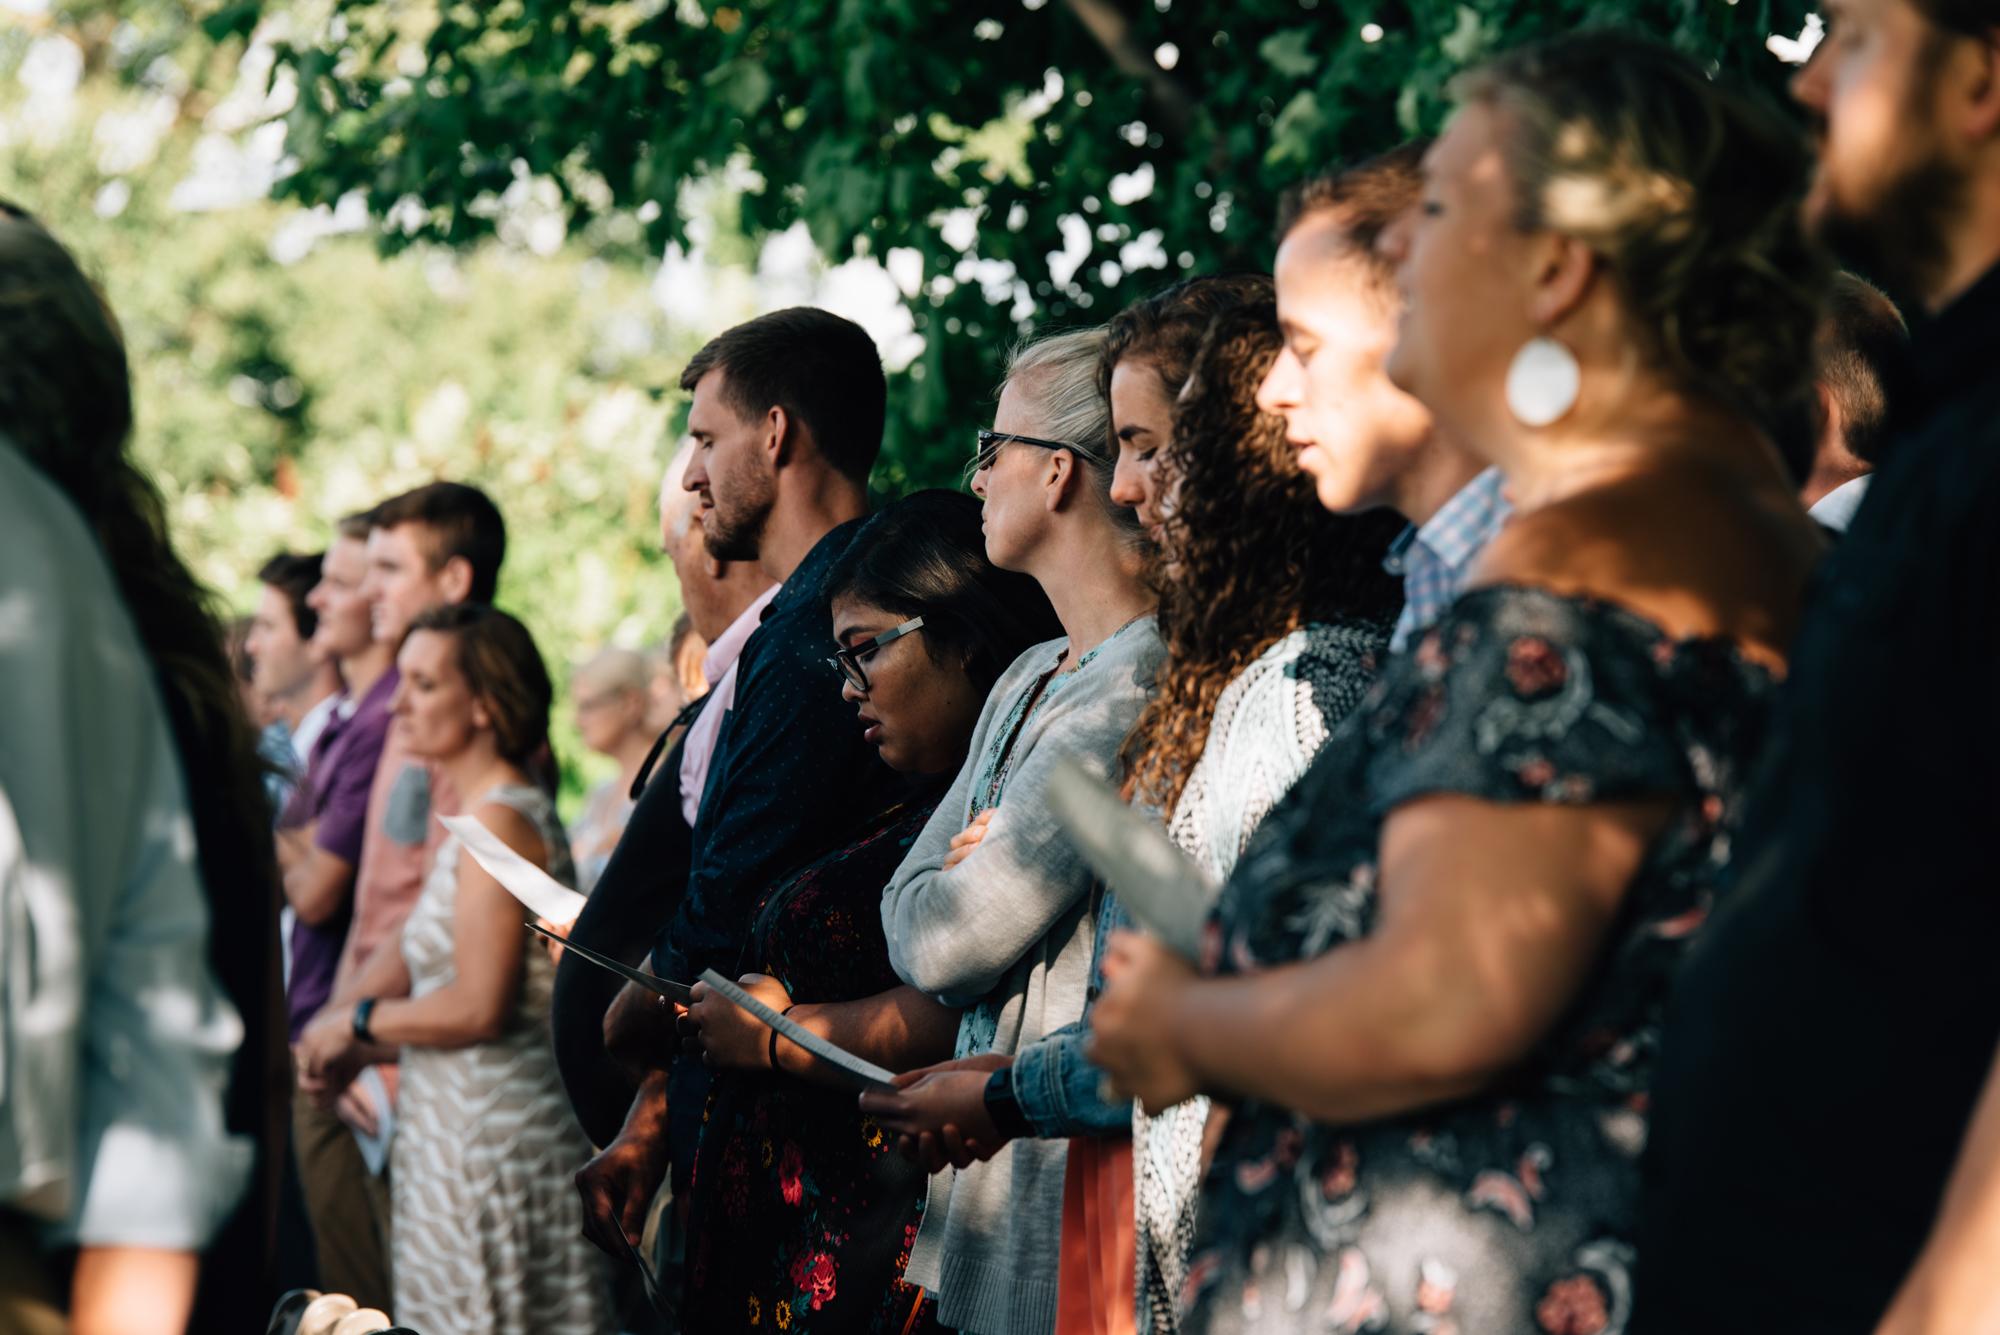 minnesota-intimate-wedding-photographer-1-5.jpg